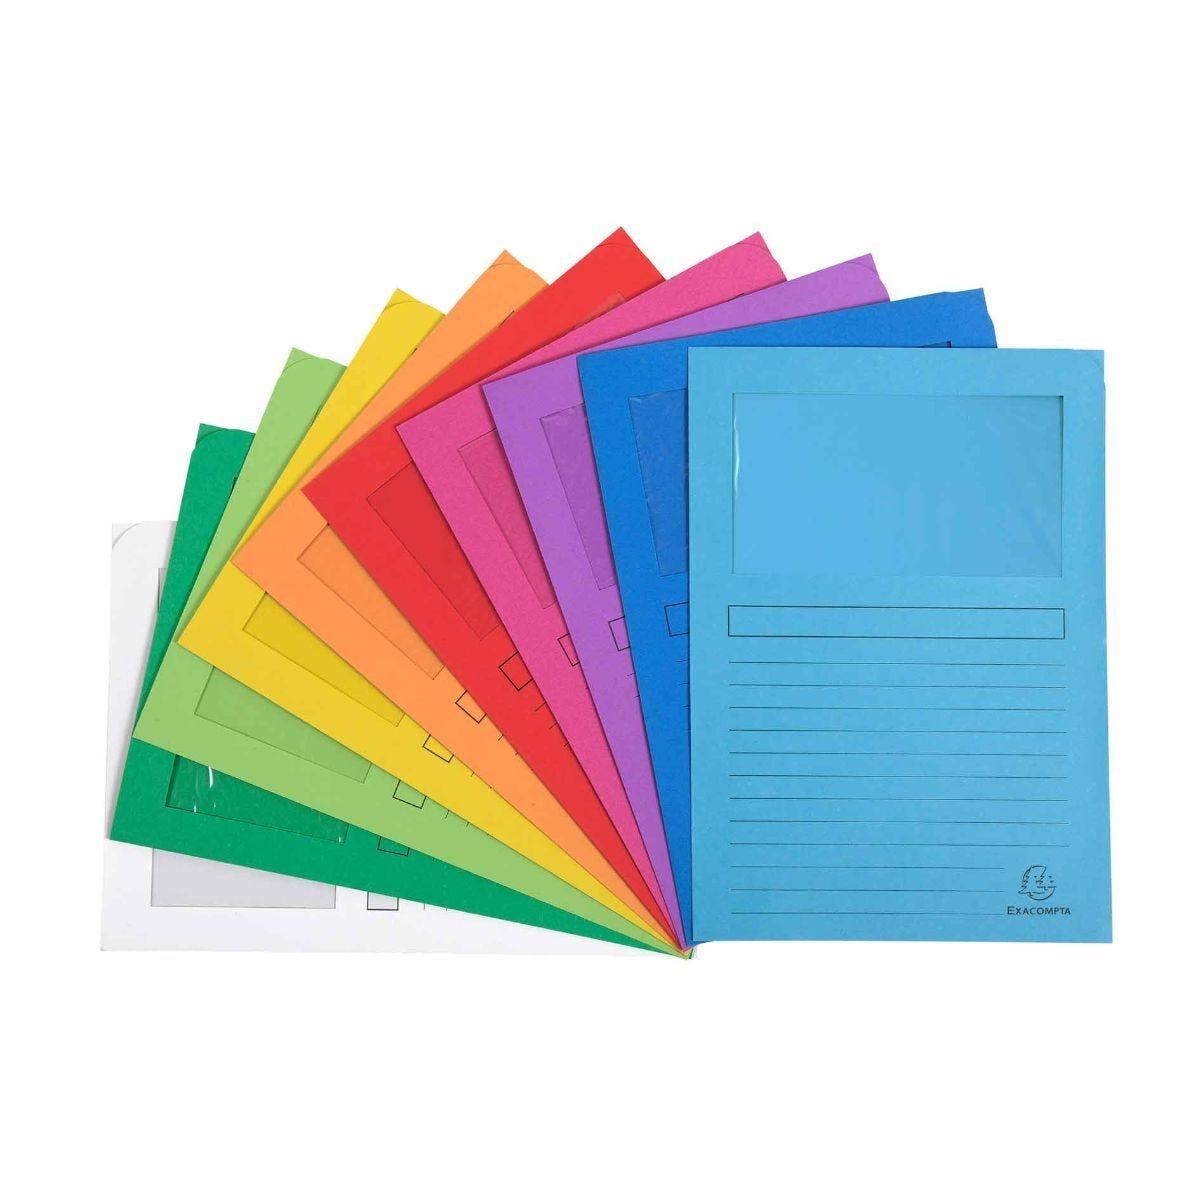 Exacompta Forever Window Folders A4 16 Packs of 25 Assorted